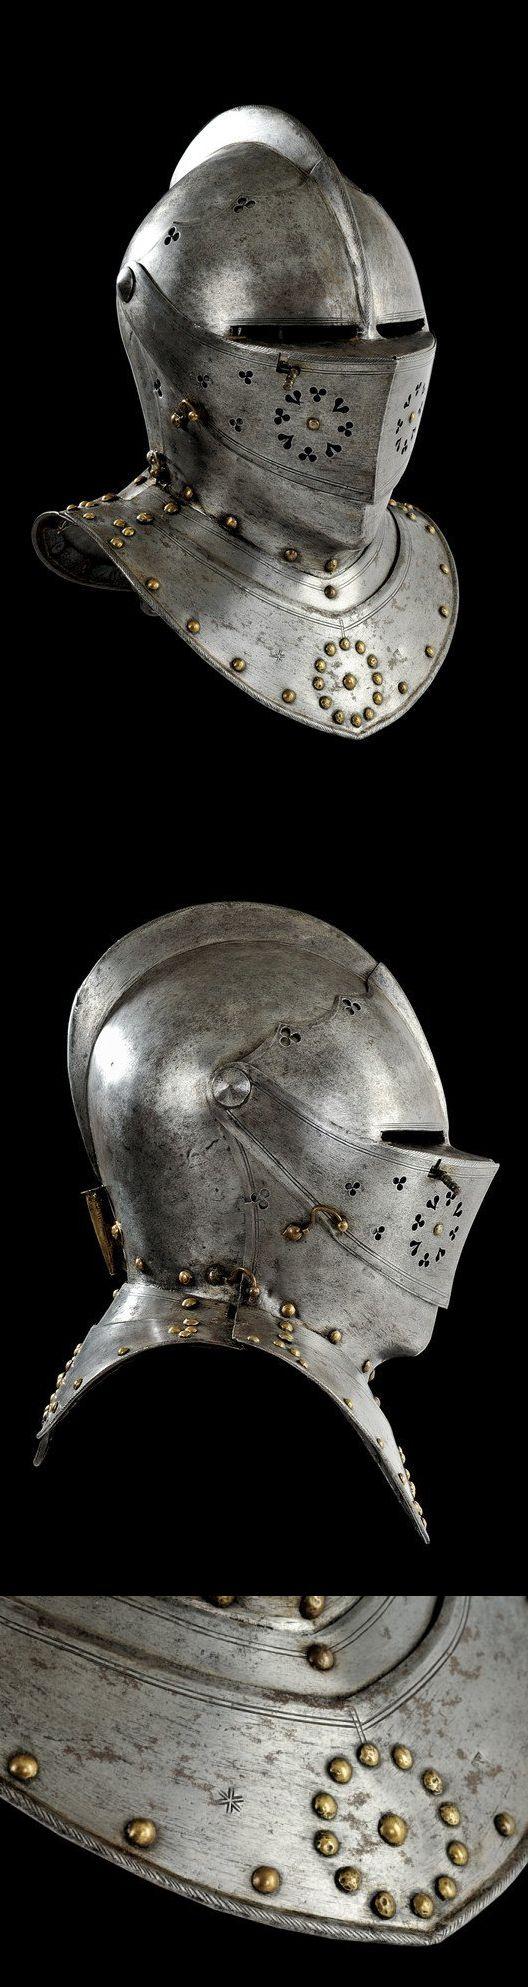 A Nuremberg combat close-helmet, Germany, 1600.